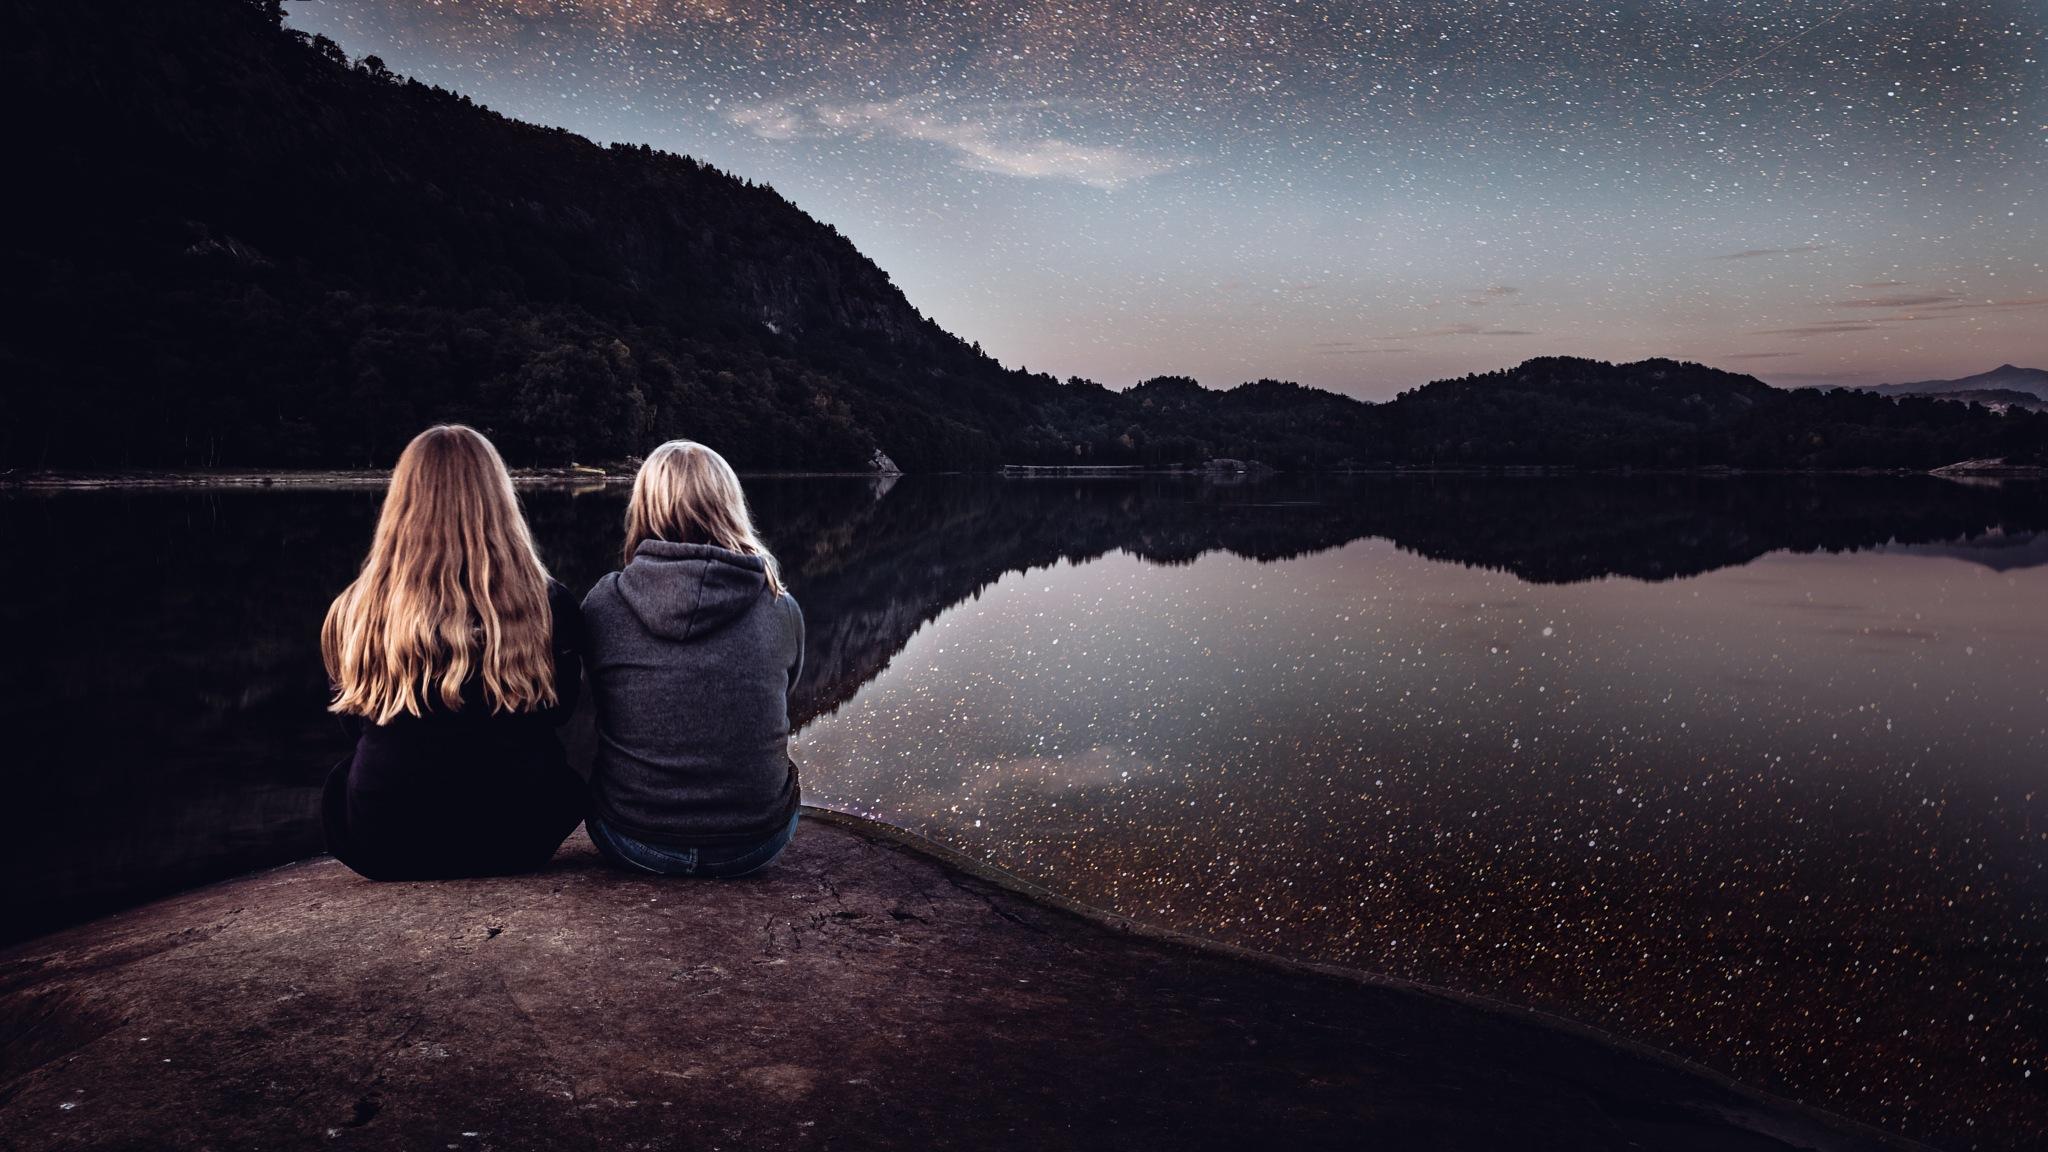 my star my friend by Jakob Sigurðarson